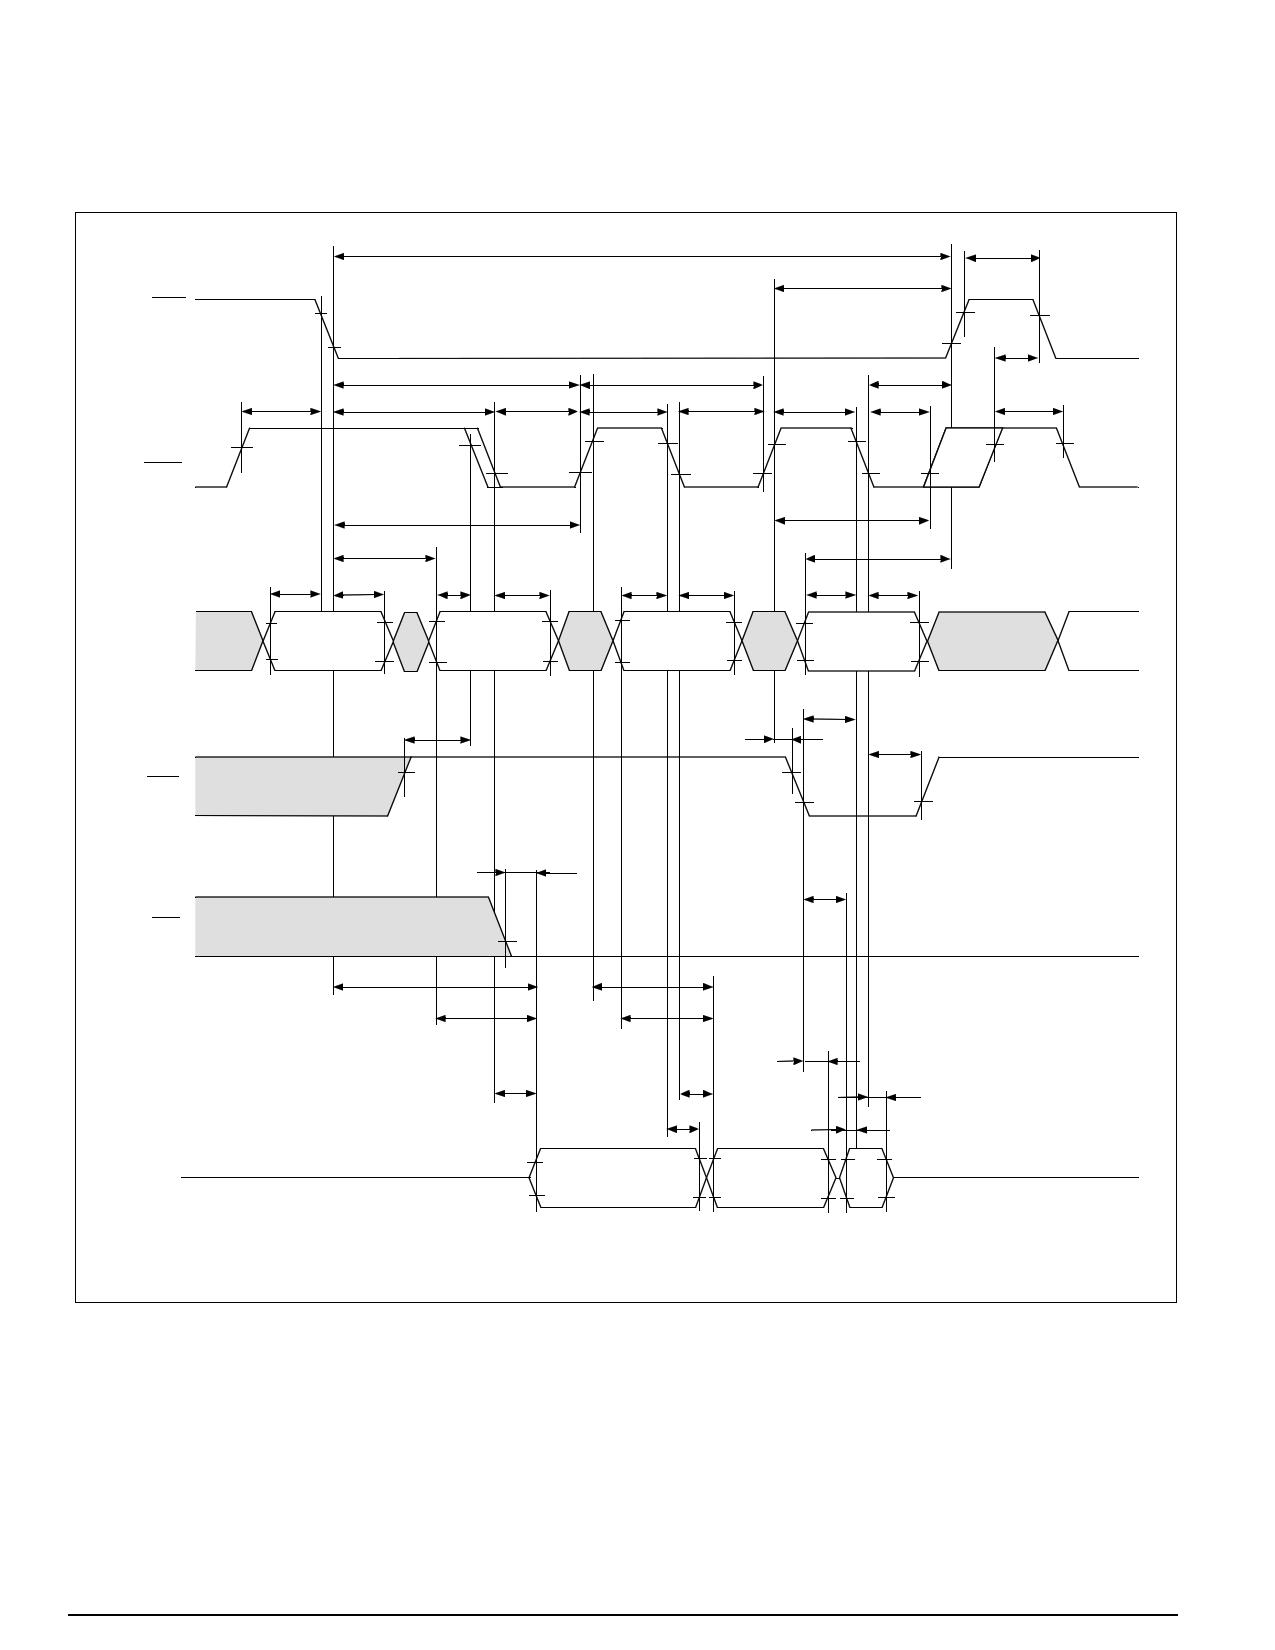 AD401M82RPA-5 transistor, igbt